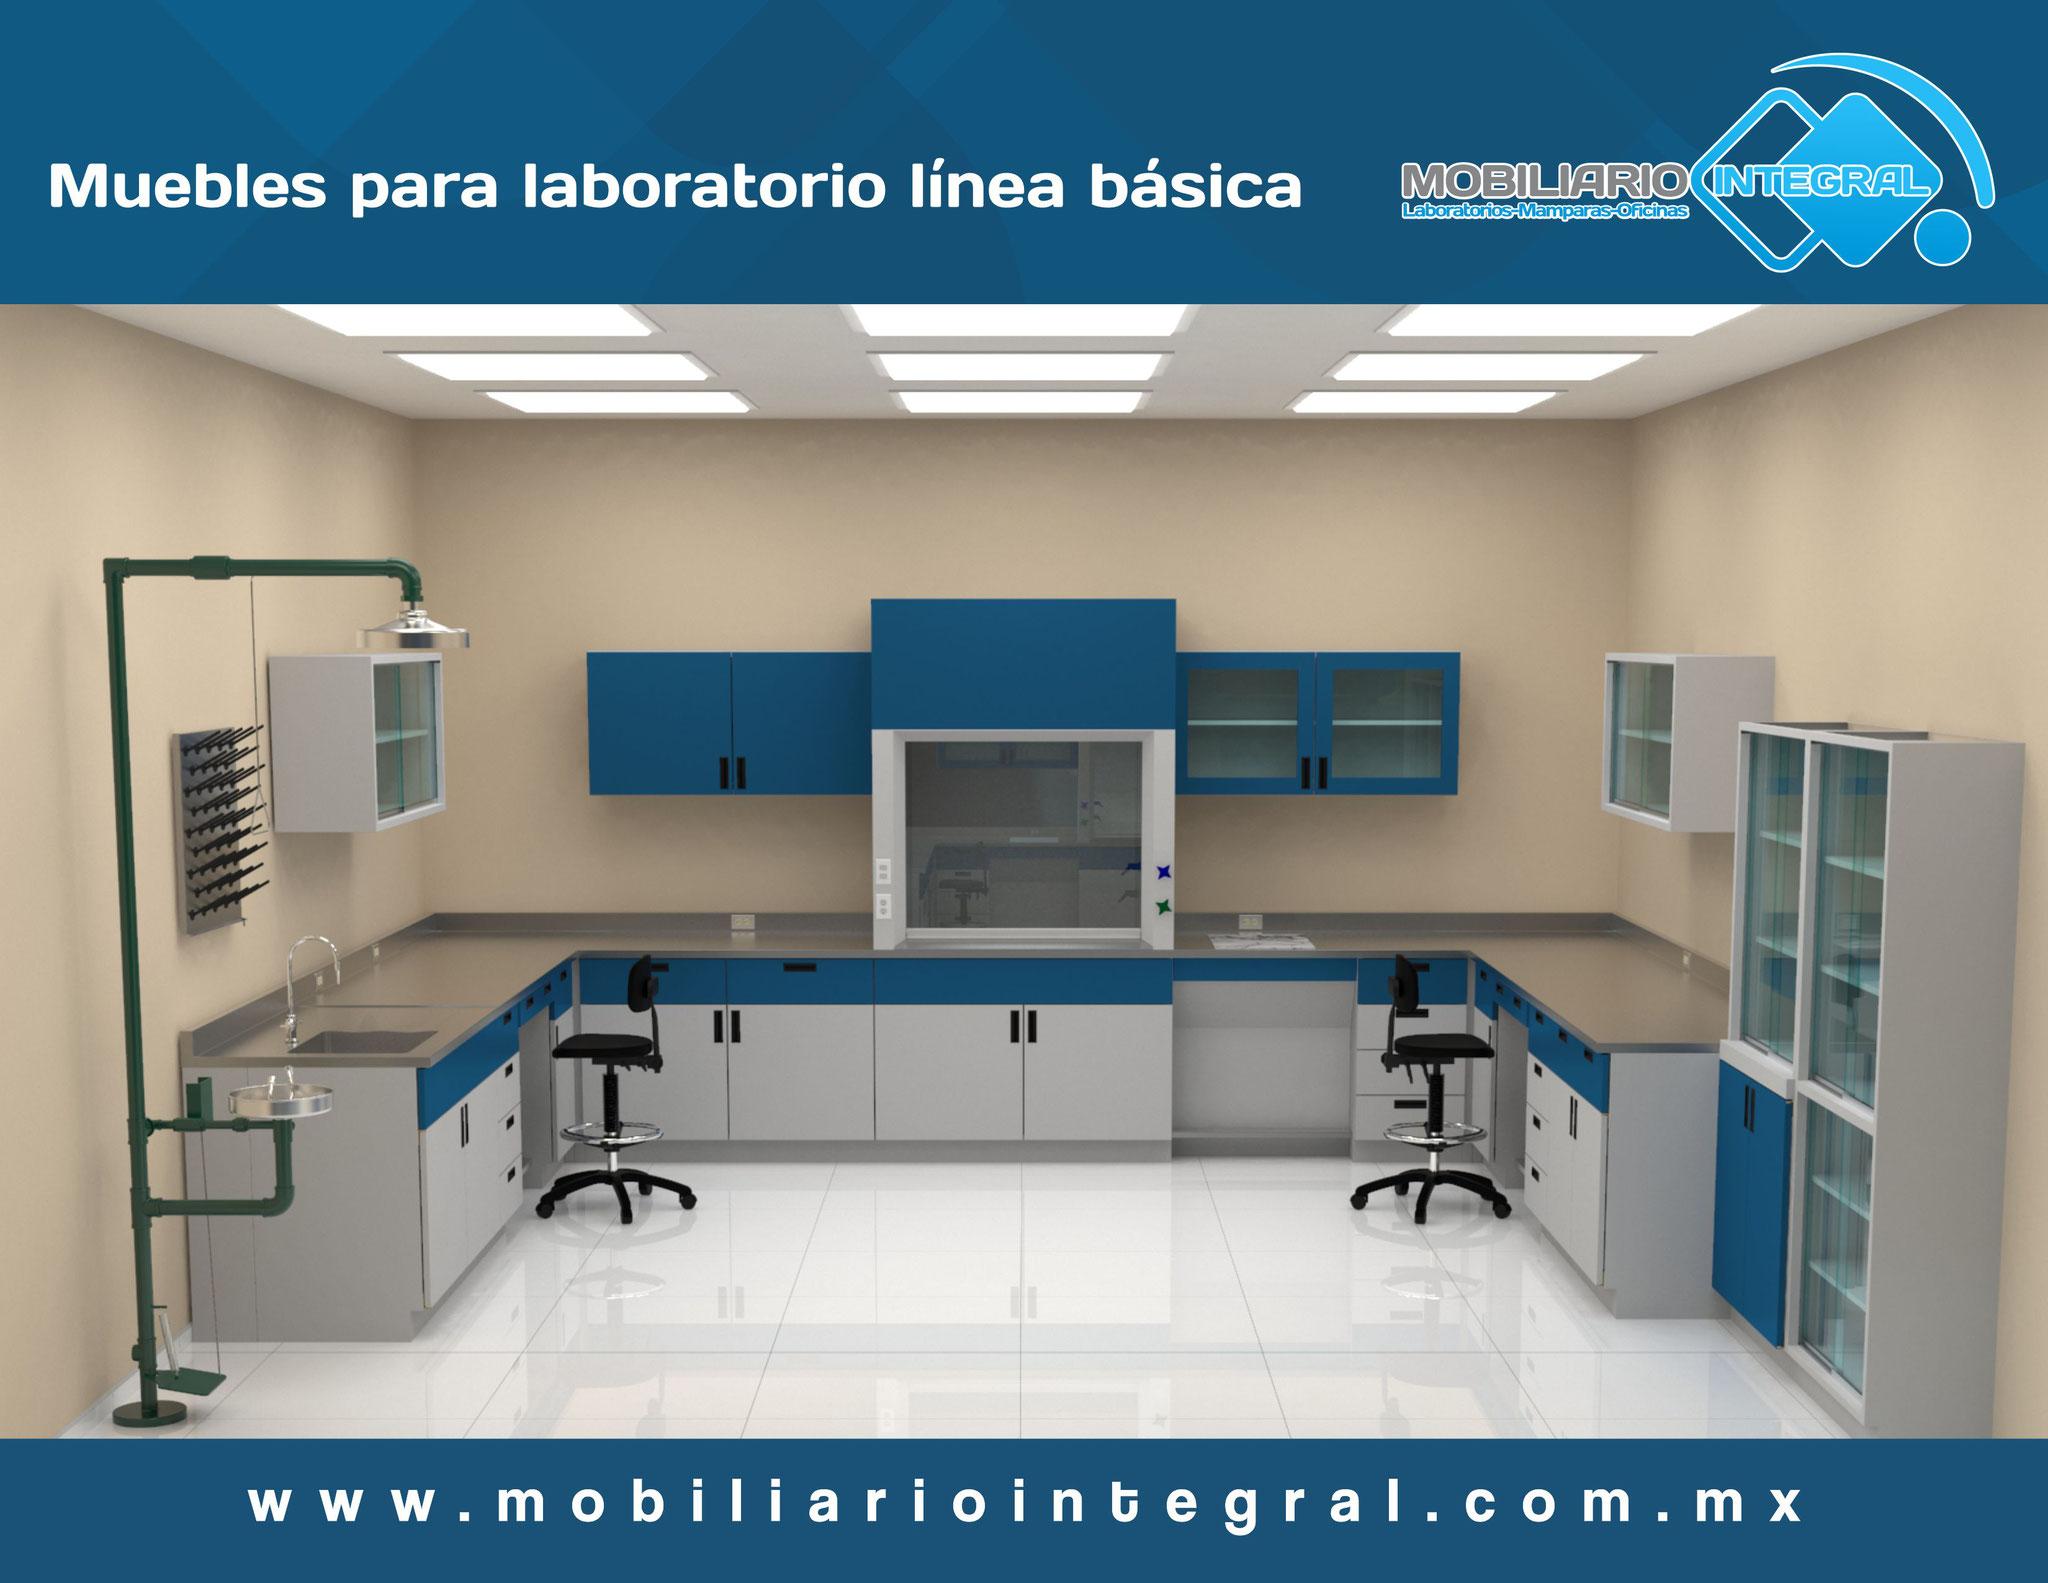 Muebles para laboratorio en Chetumal